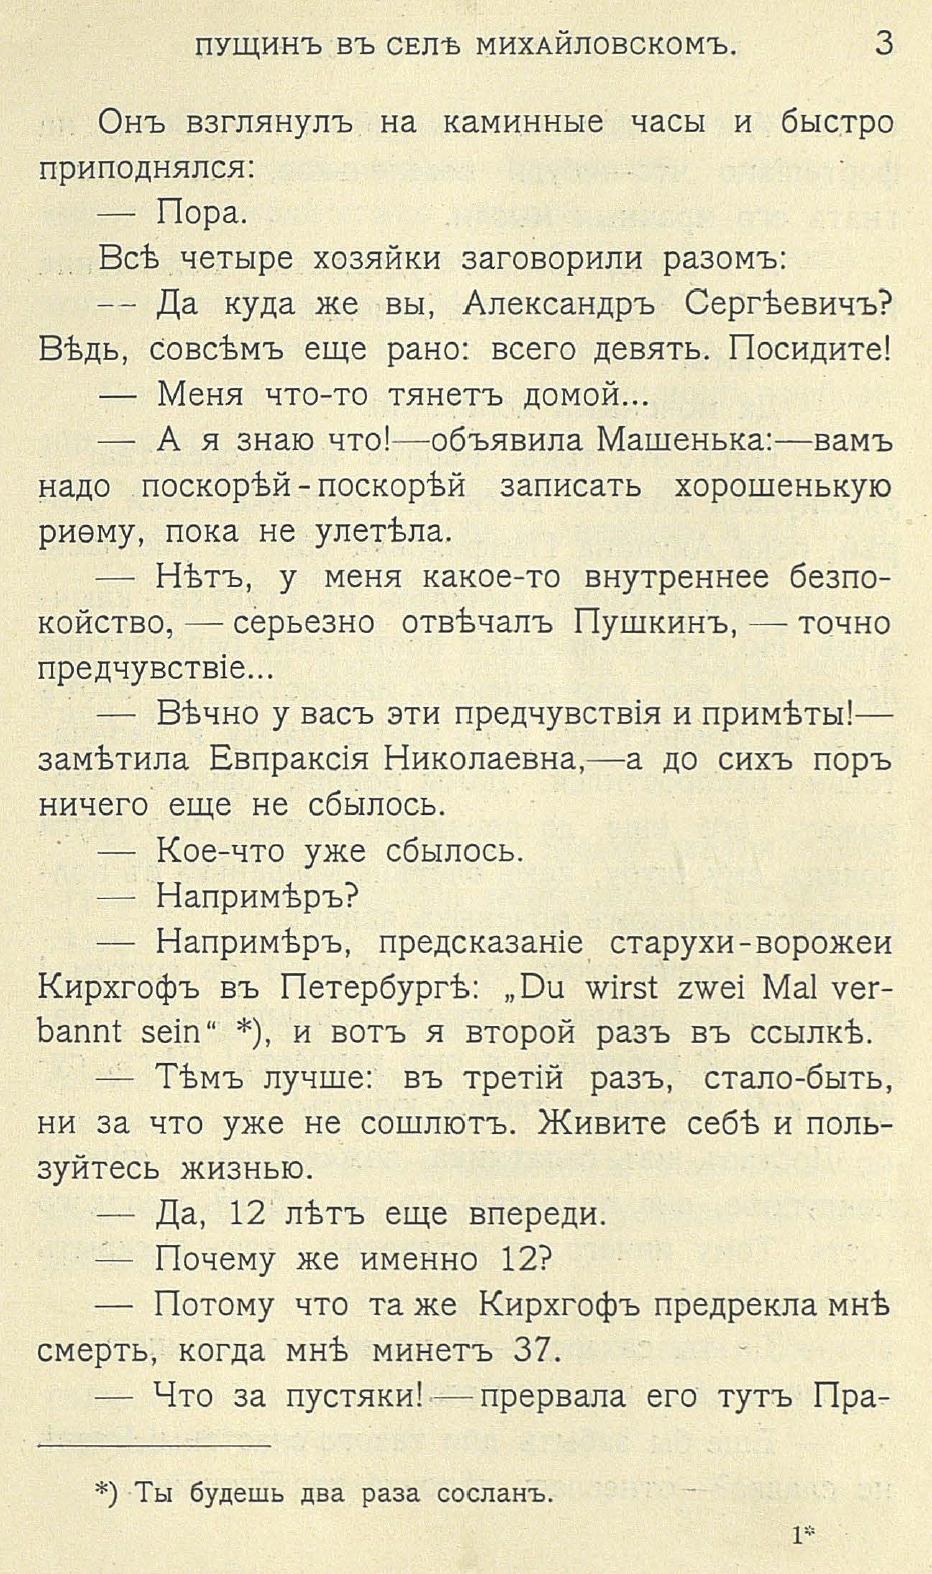 http://images.vfl.ru/ii/1407086381/f4d137ed/5887726.jpg